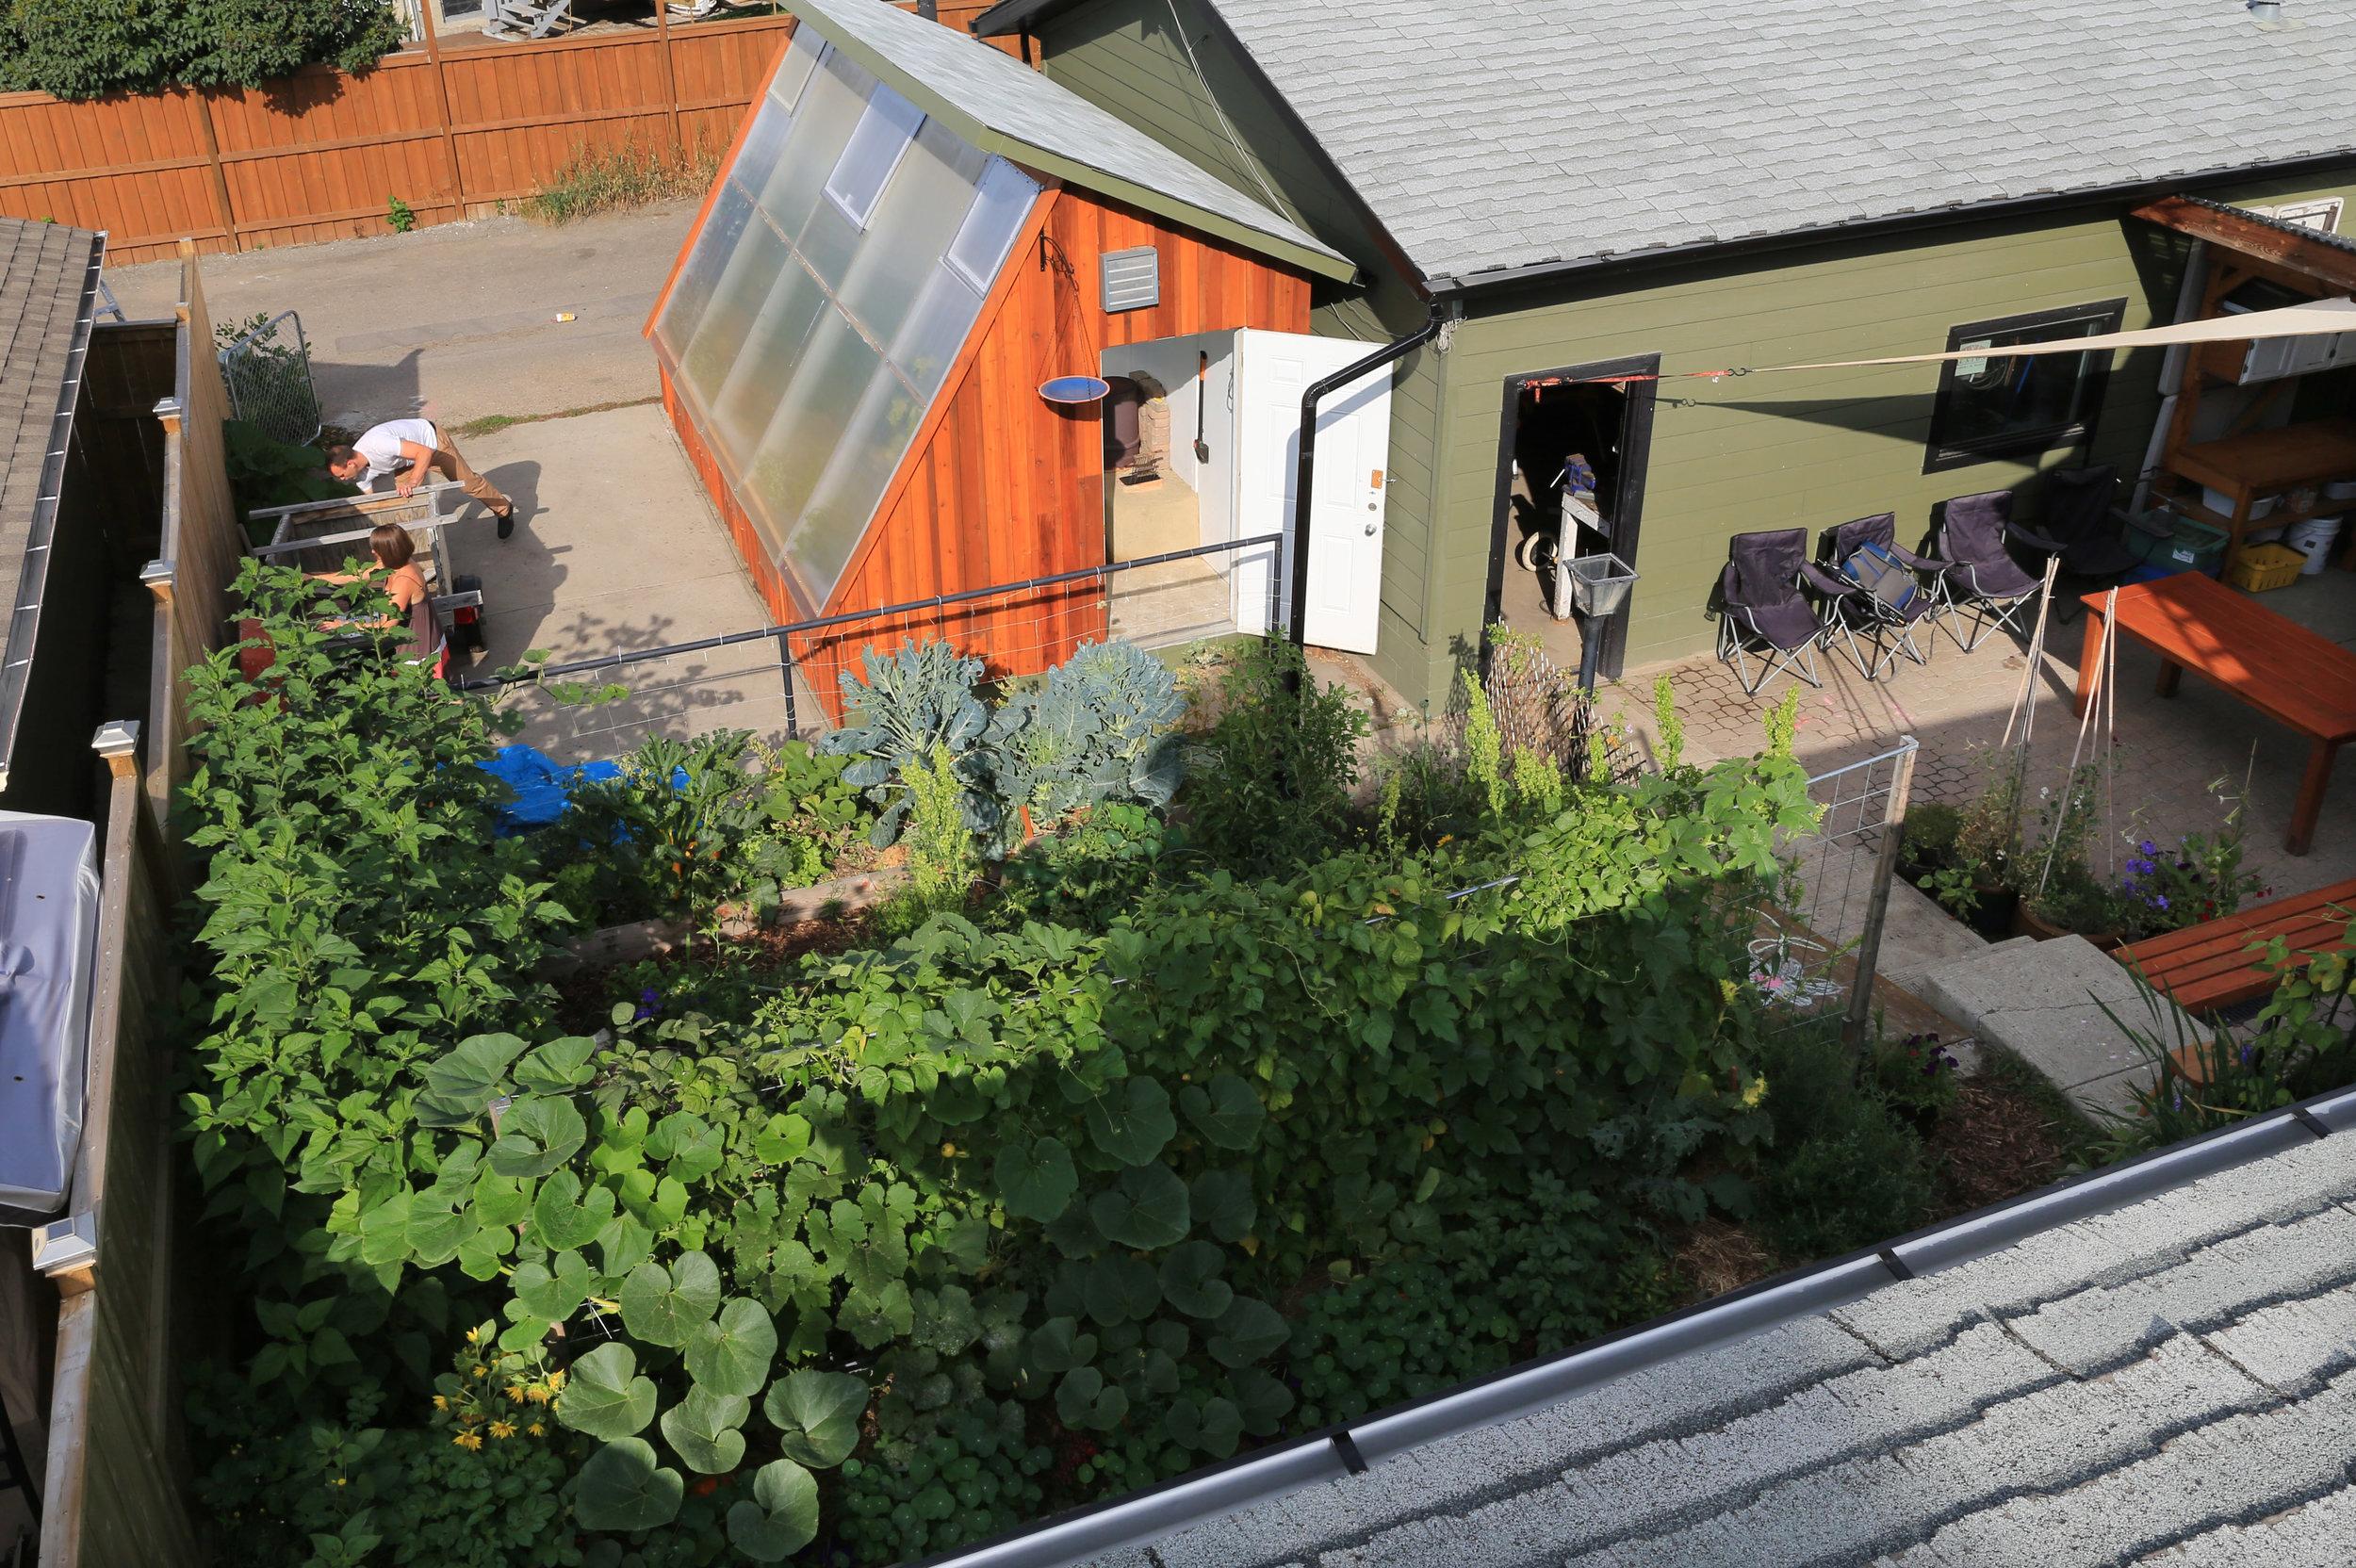 Rob's backyard greenhouse.